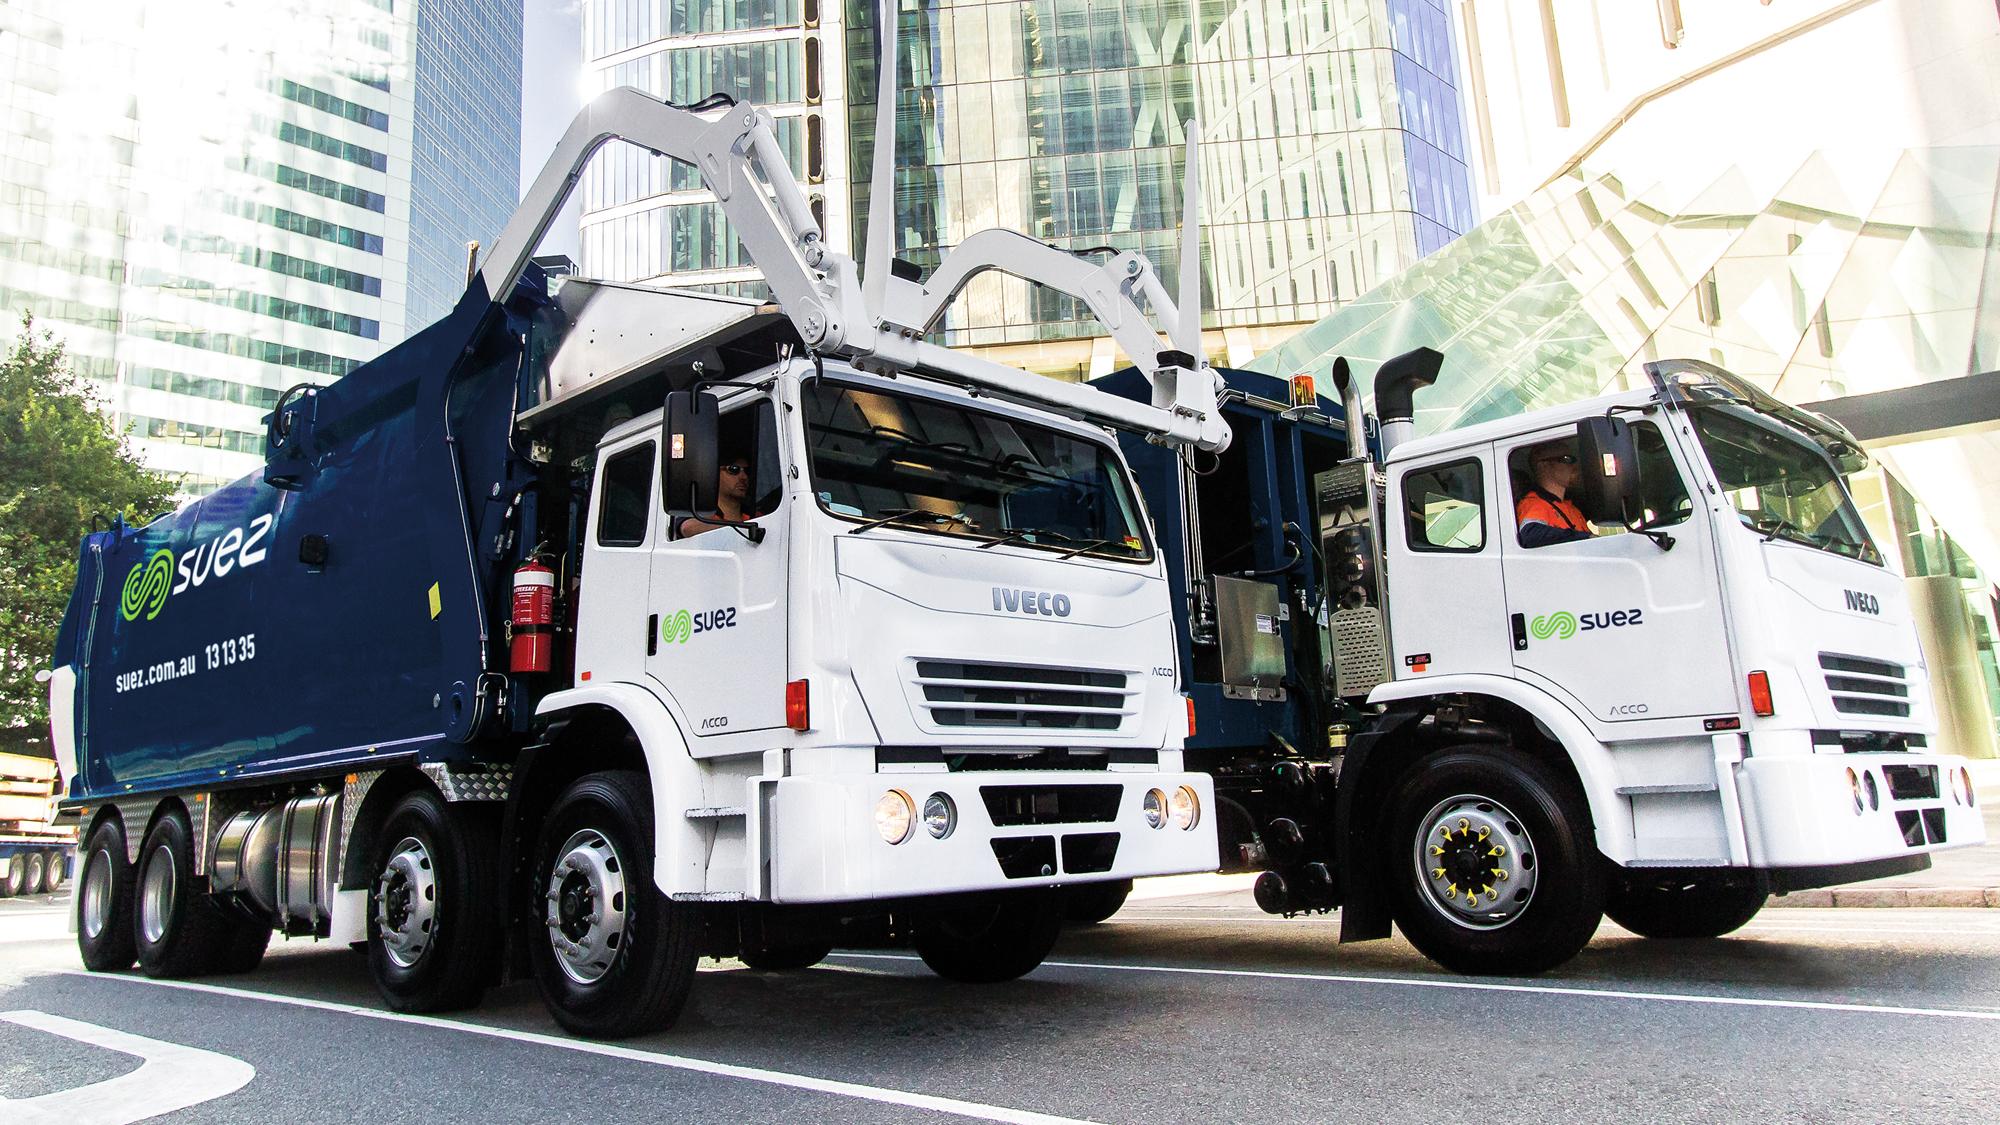 Vehicles - SUEZ in Australia and New Zealand